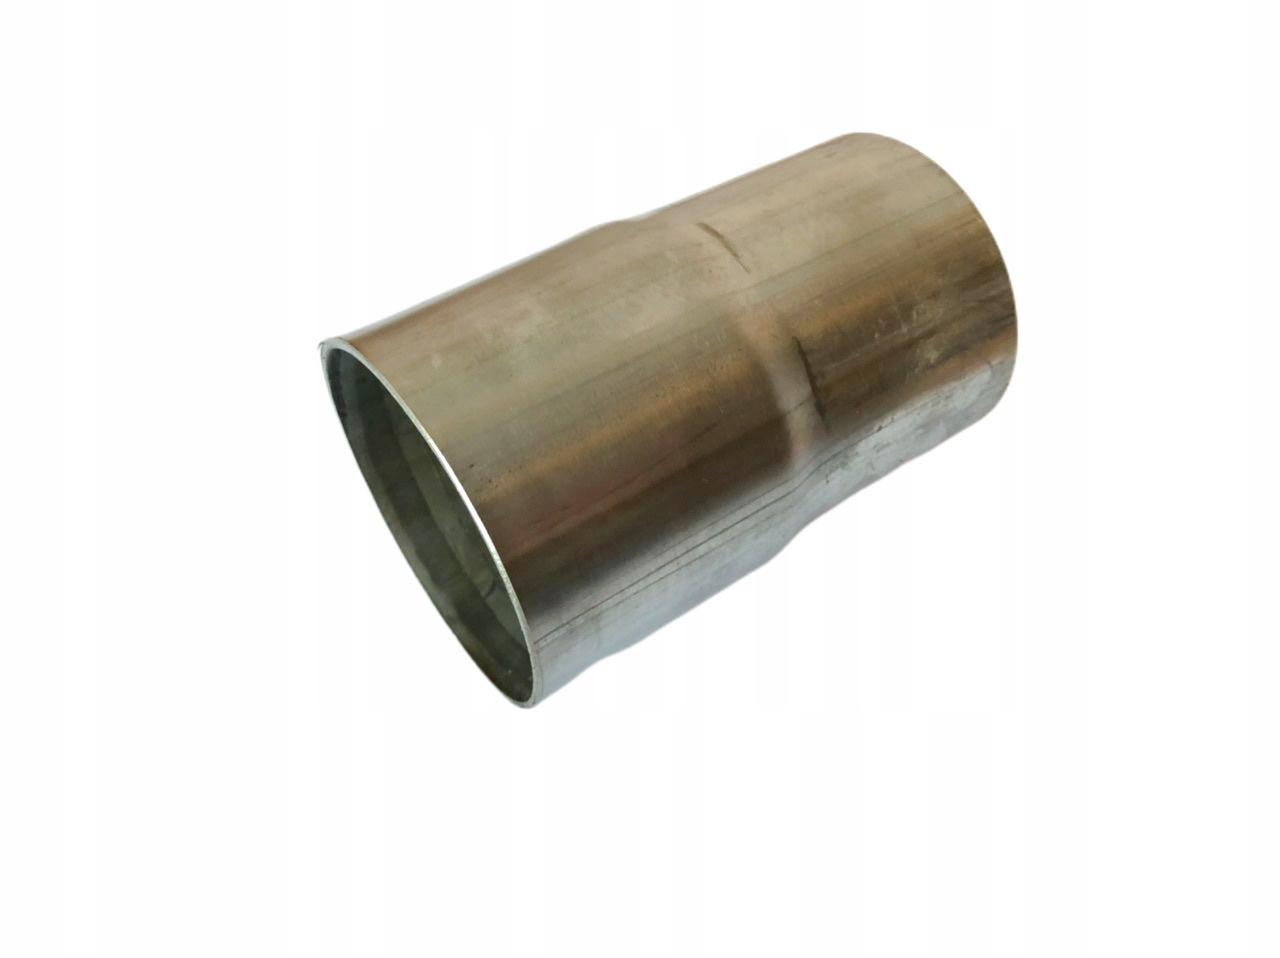 уменьшение заколка roztłoczenie сталь 475053